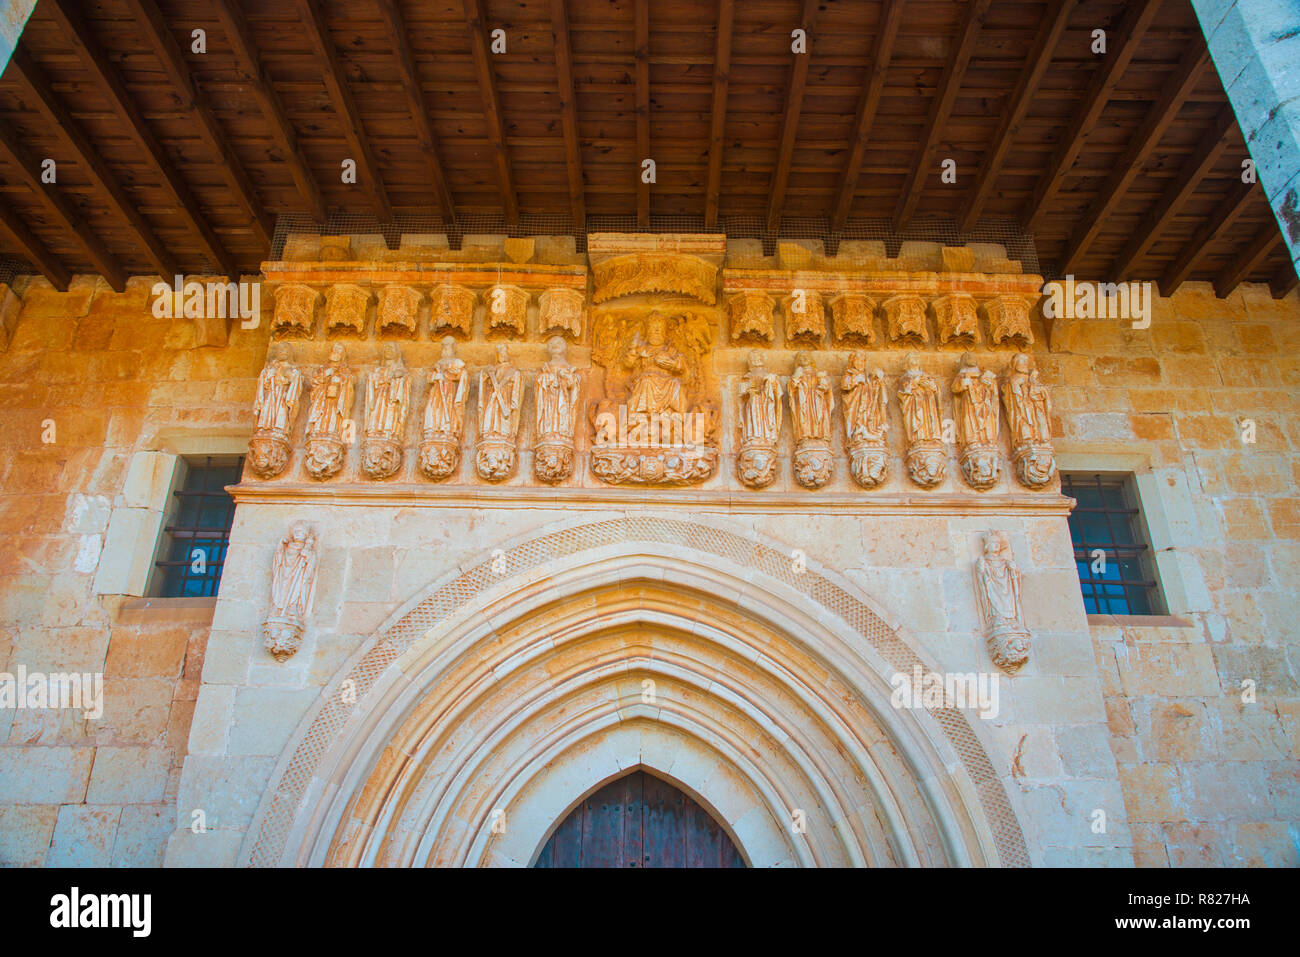 Facade of the Romanesque church. Pison de Castrejon, Palencia province, Castilla Leon, Spain. - Stock Image